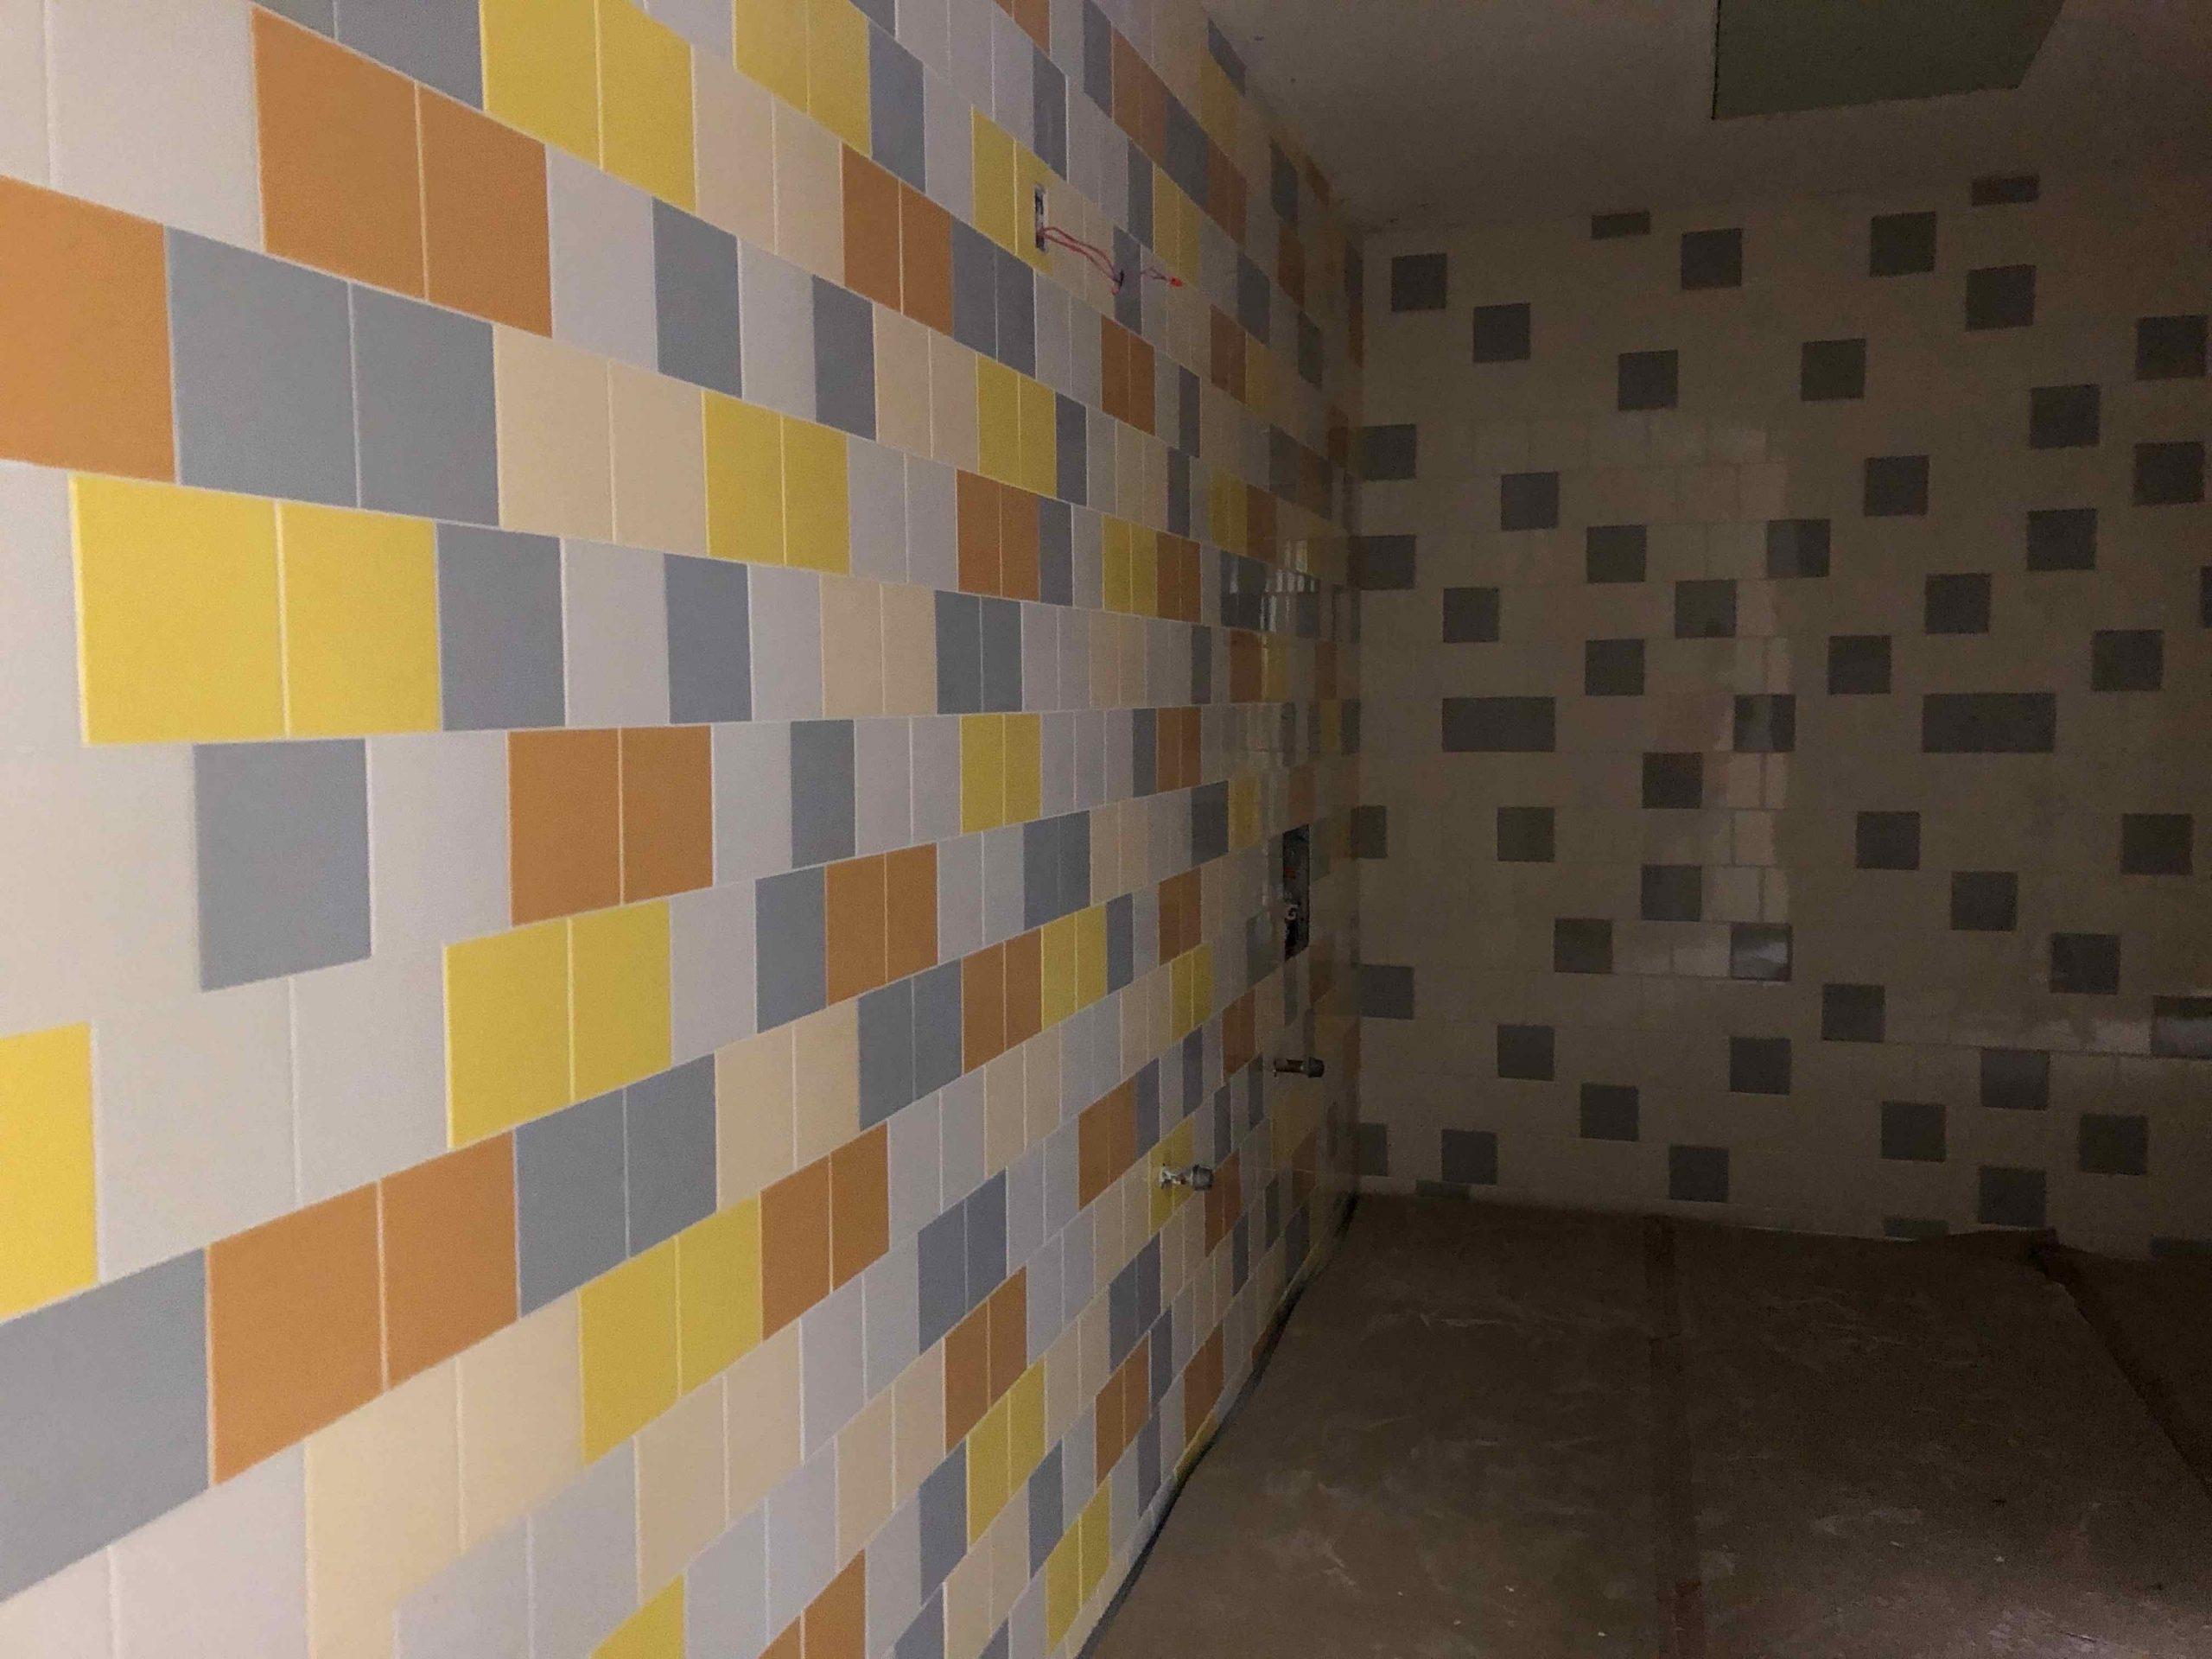 Restroom Renovations Near Completion image 1